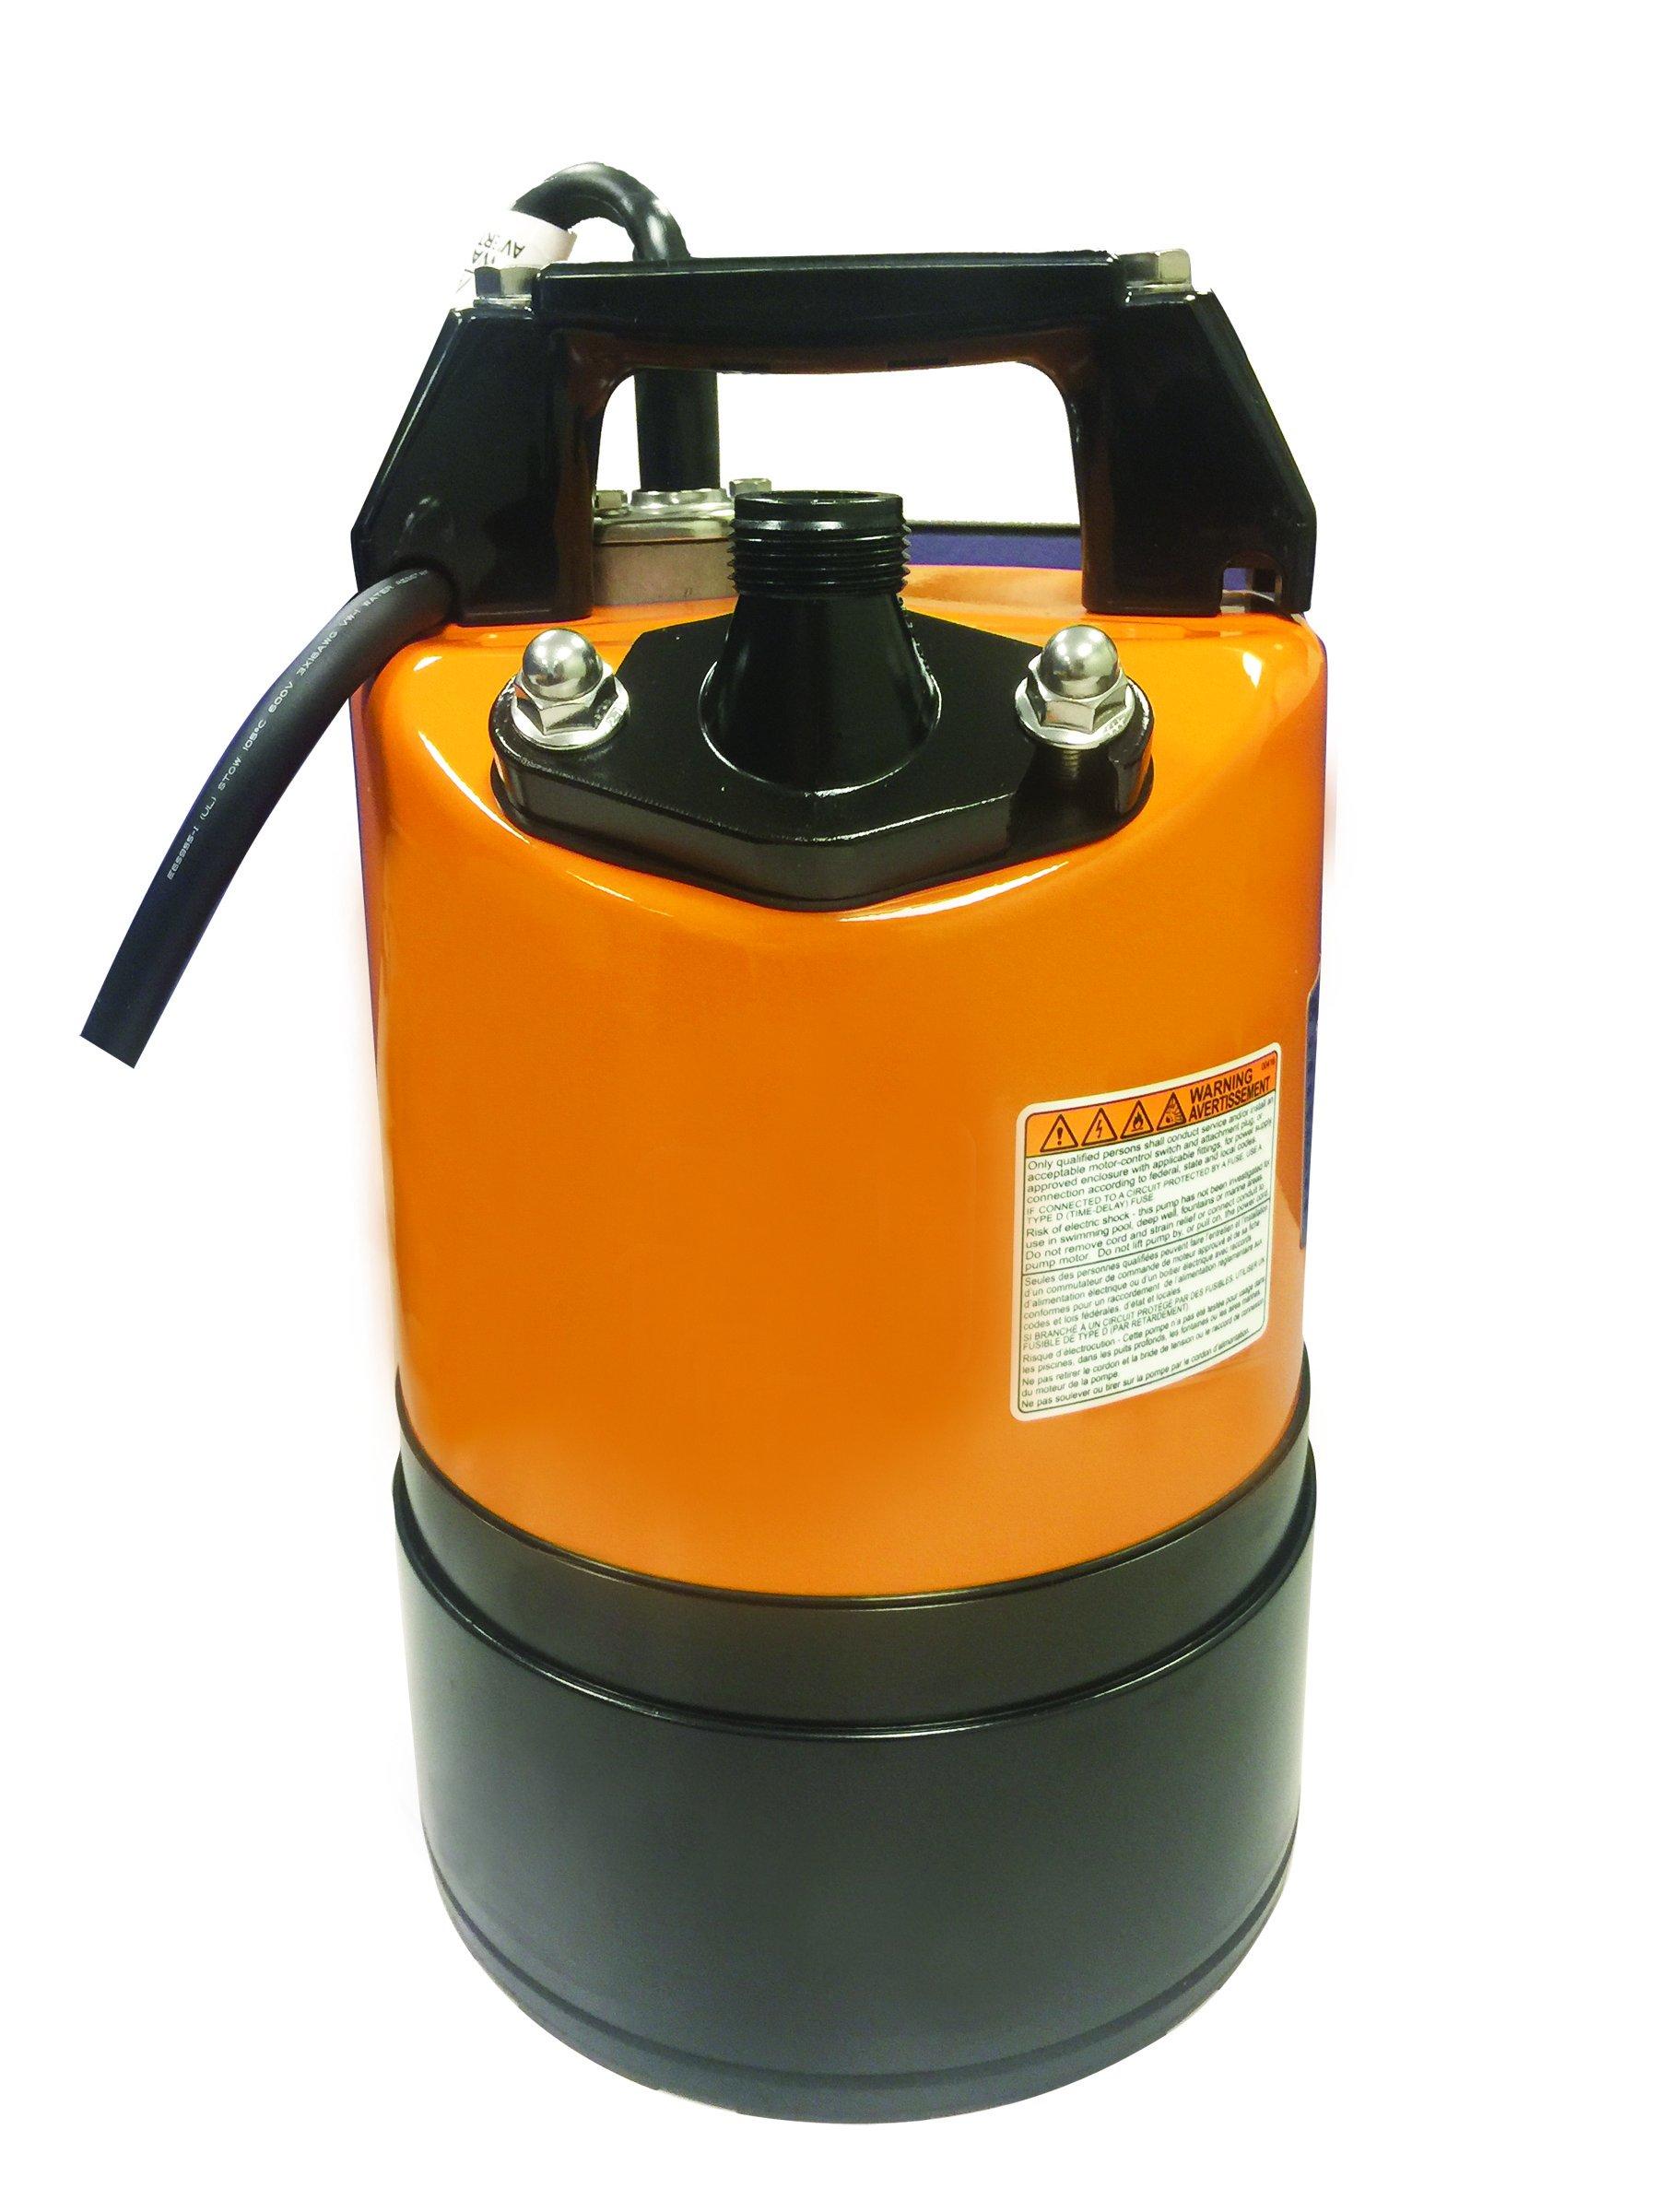 Tsurumi LSC1.4S; submersible ground drainage pump, 2/3hp, 115V, 3/4'' discharge